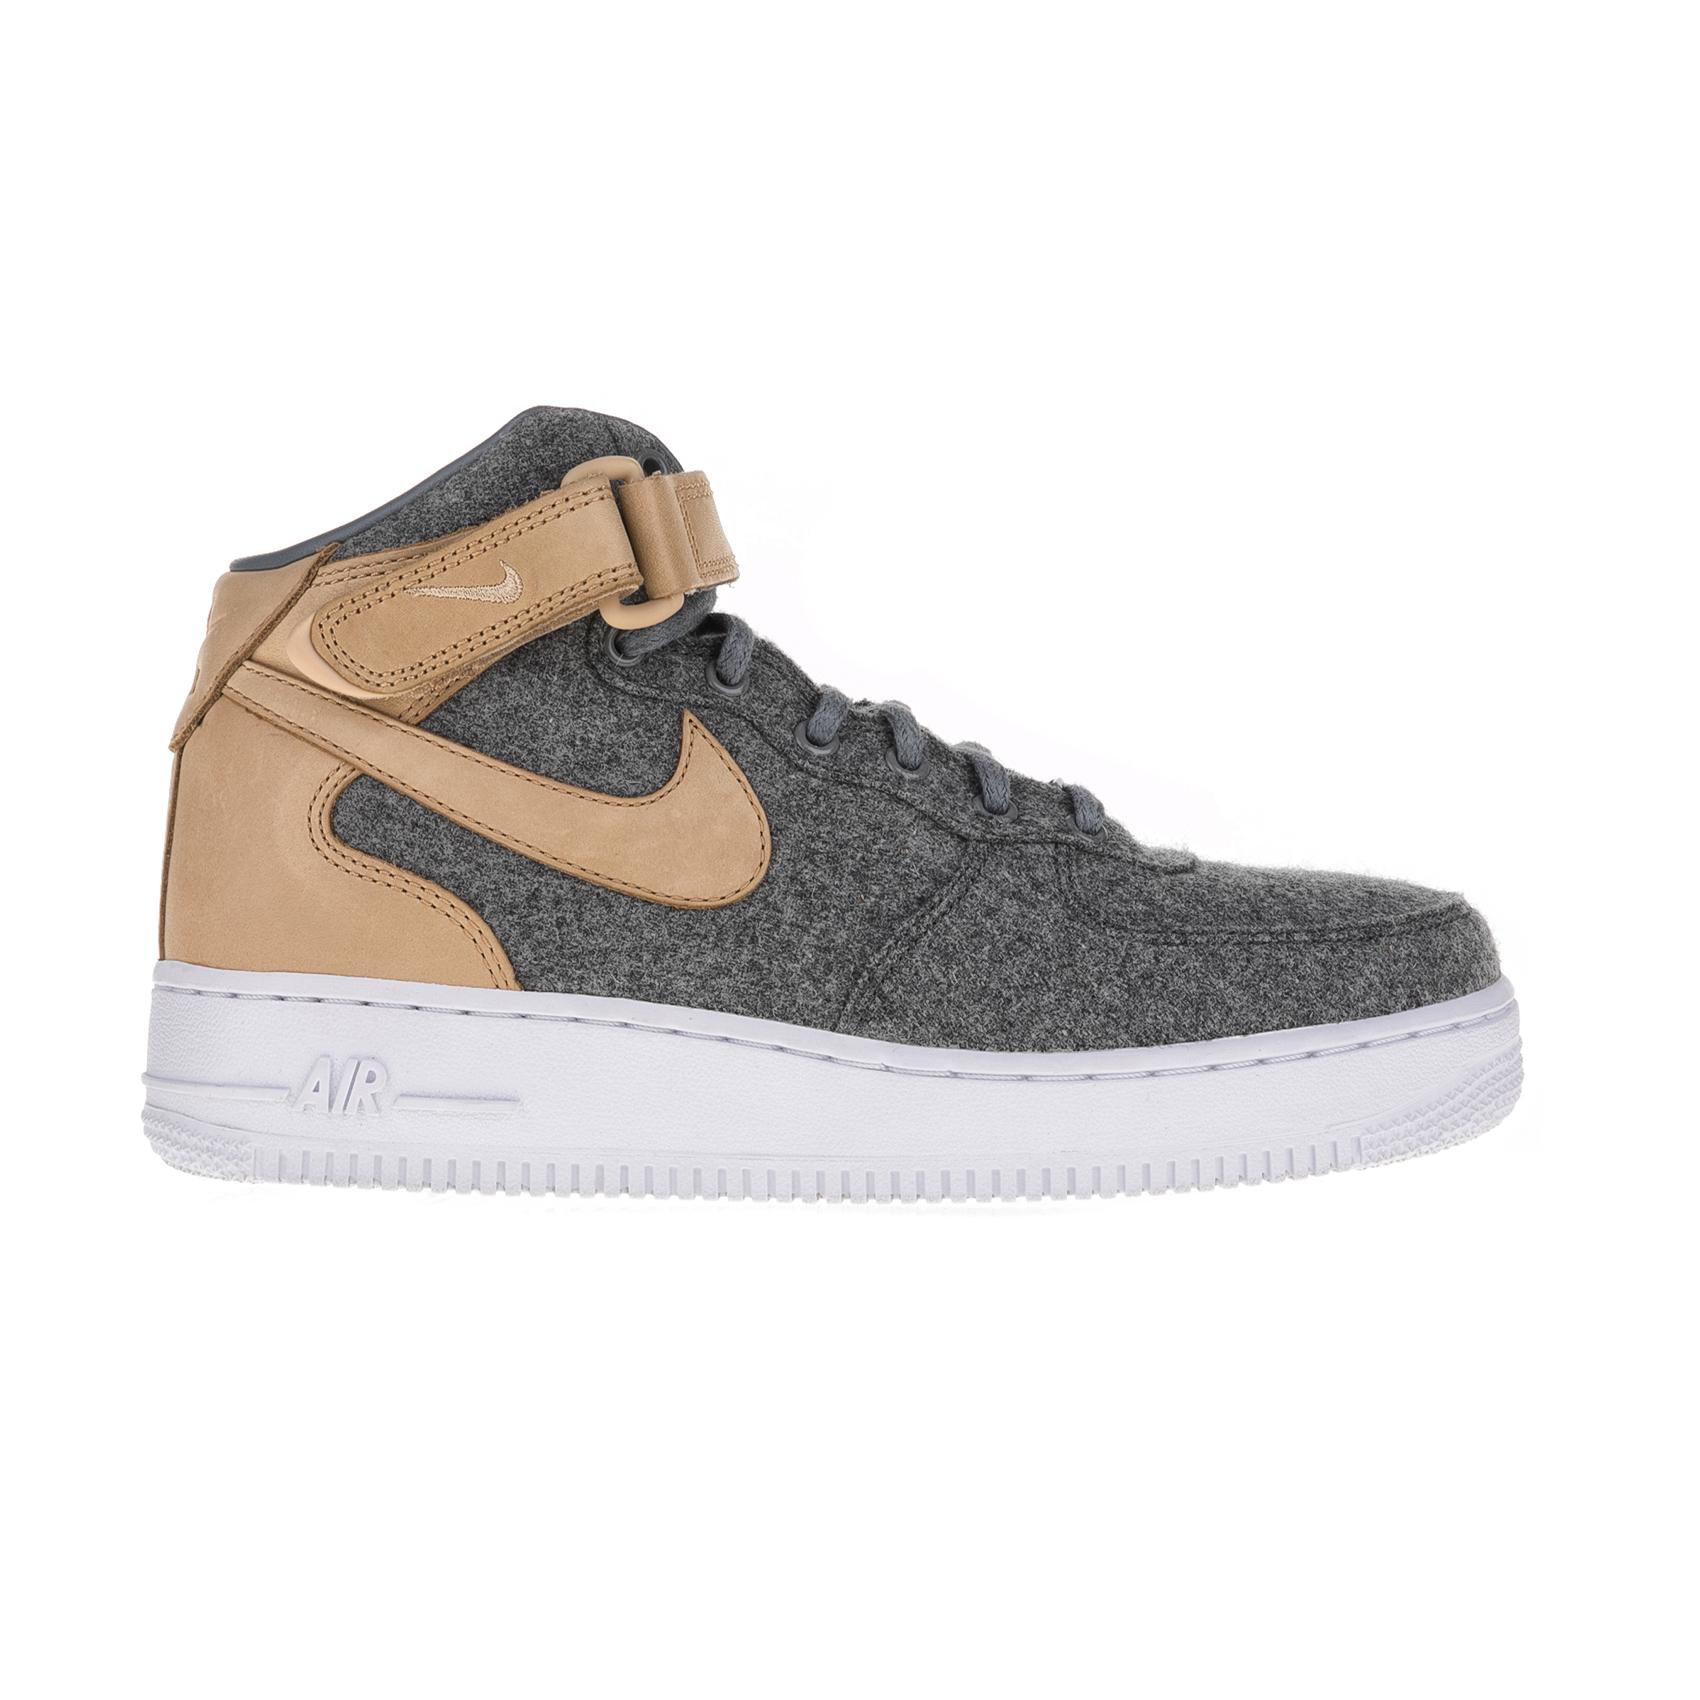 NIKE – Γυναικεία παπούτσια Nike AIR FORCE 1 '07 MID LTHR PRM γκρι